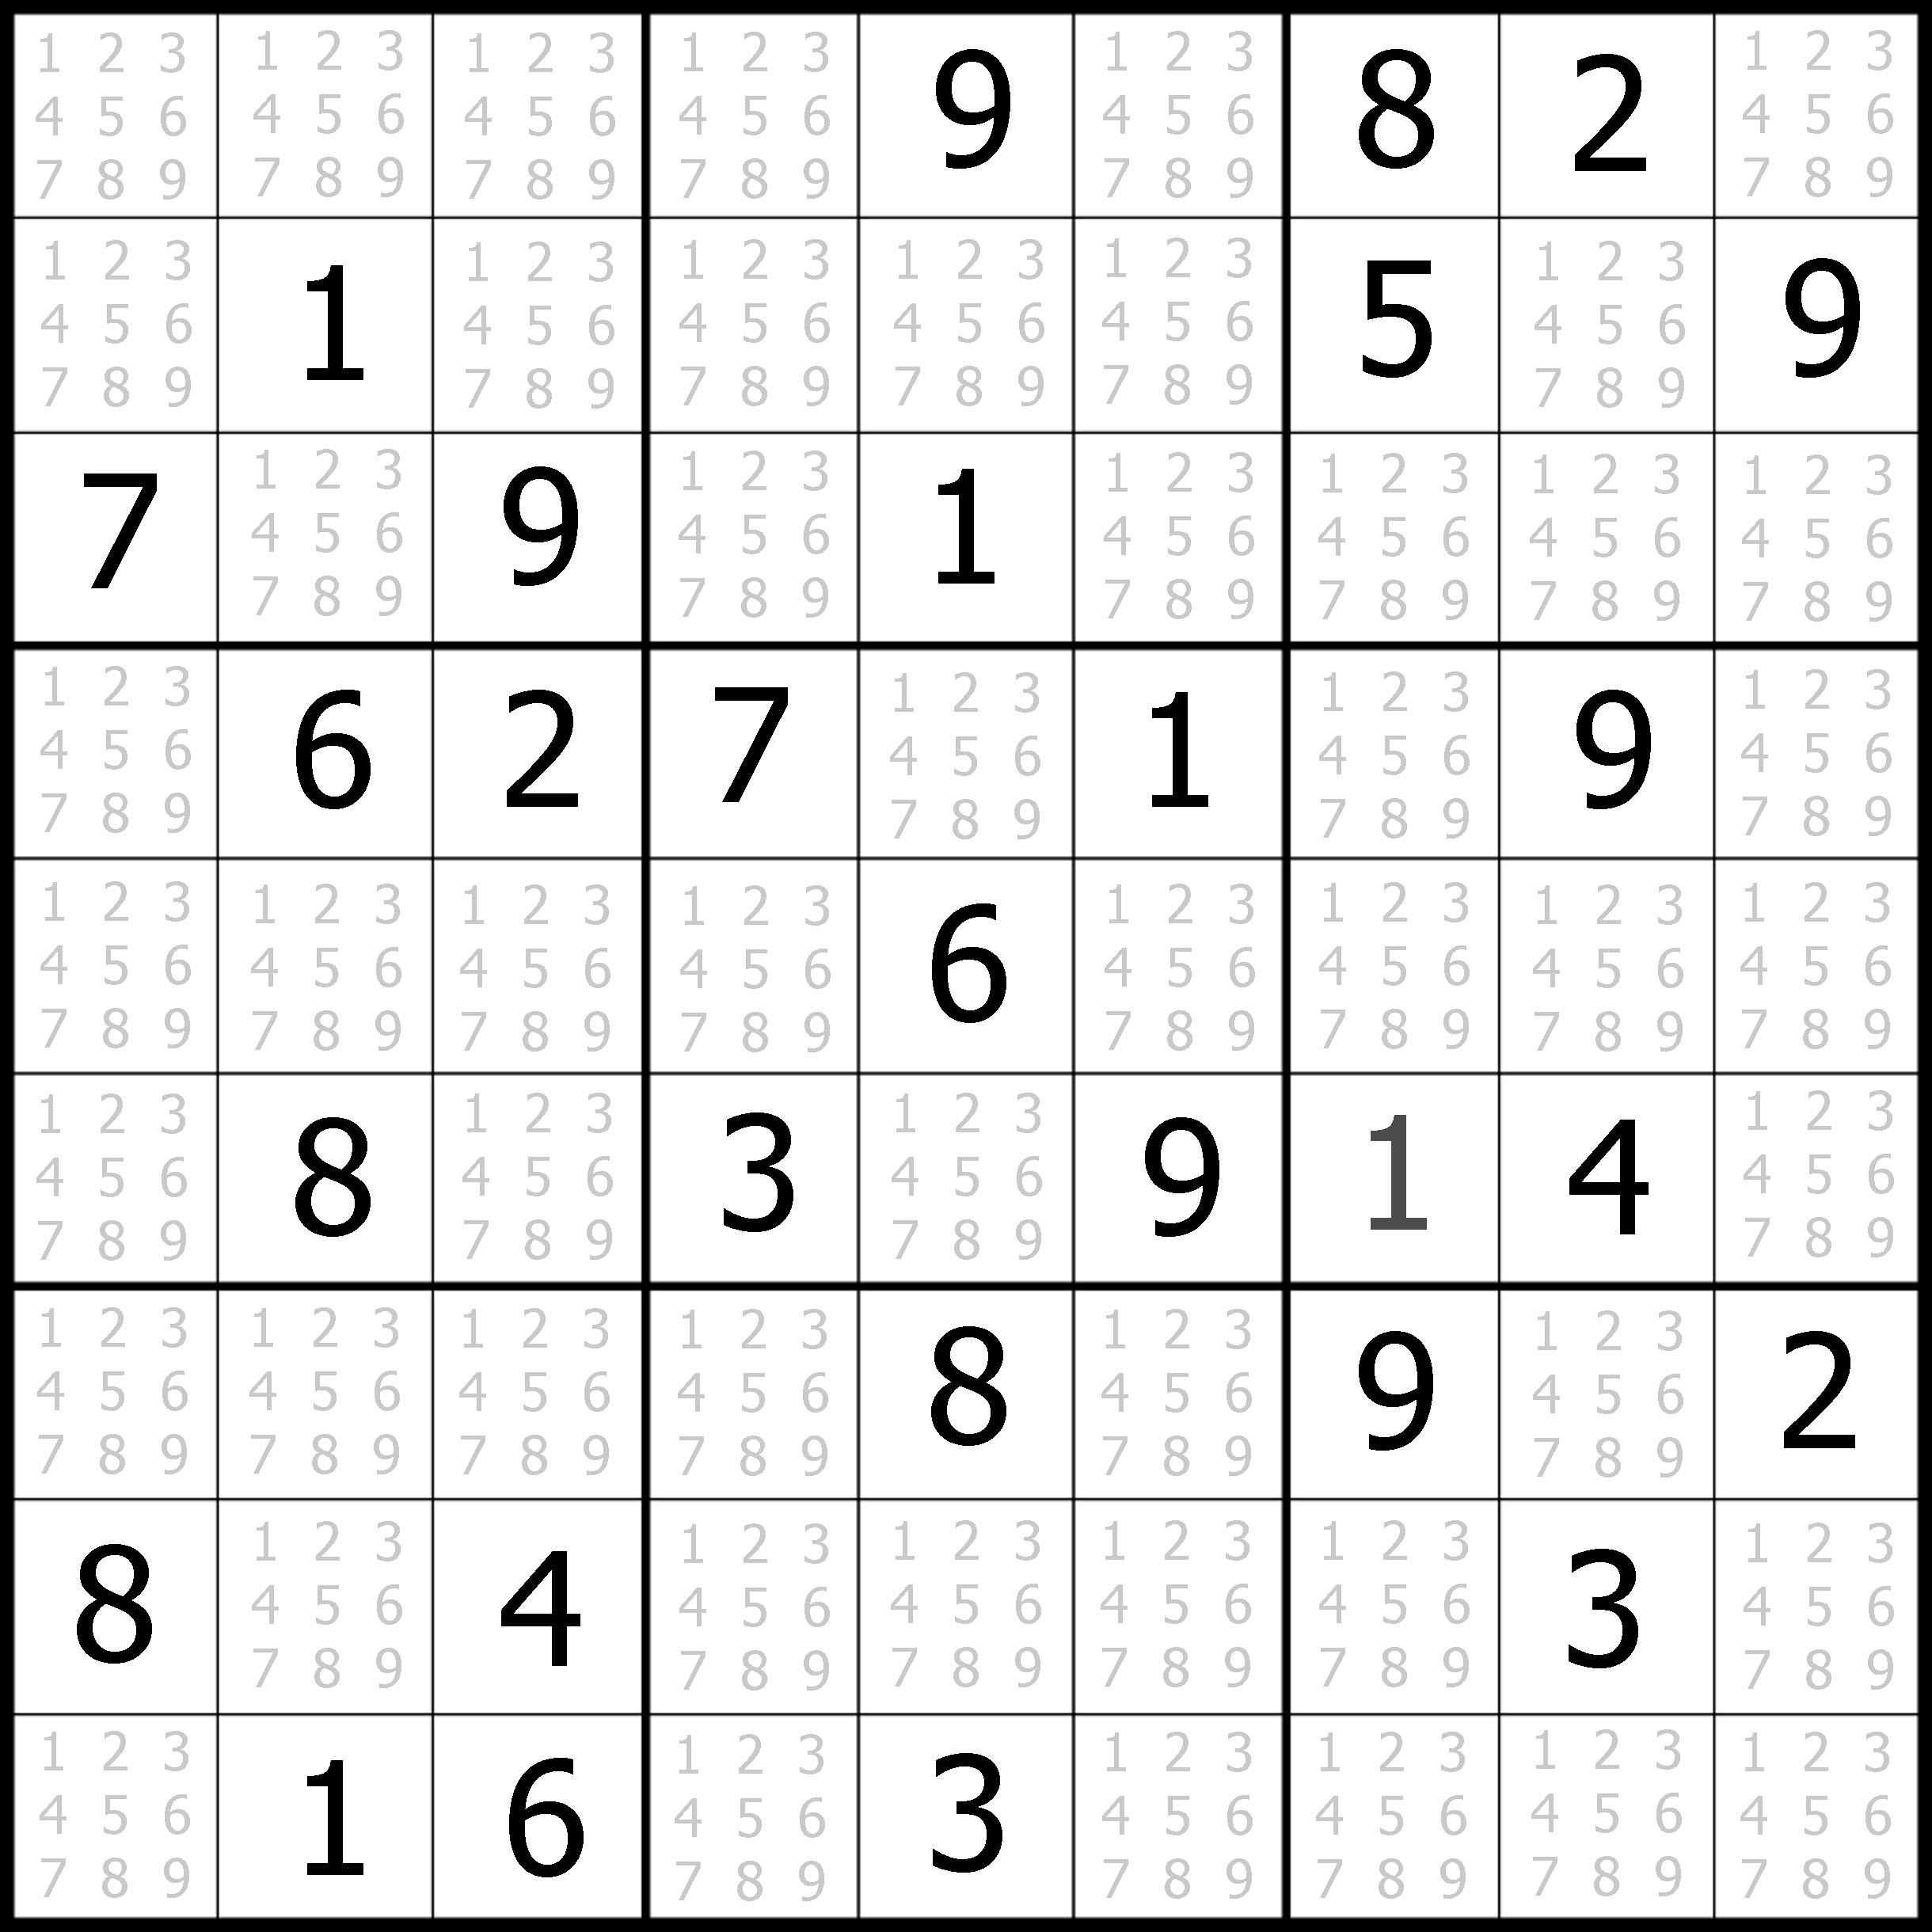 Sudoku Puzzler | Free, Printable, Updated Sudoku Puzzles With A - Printable Sudoku Puzzles Easy